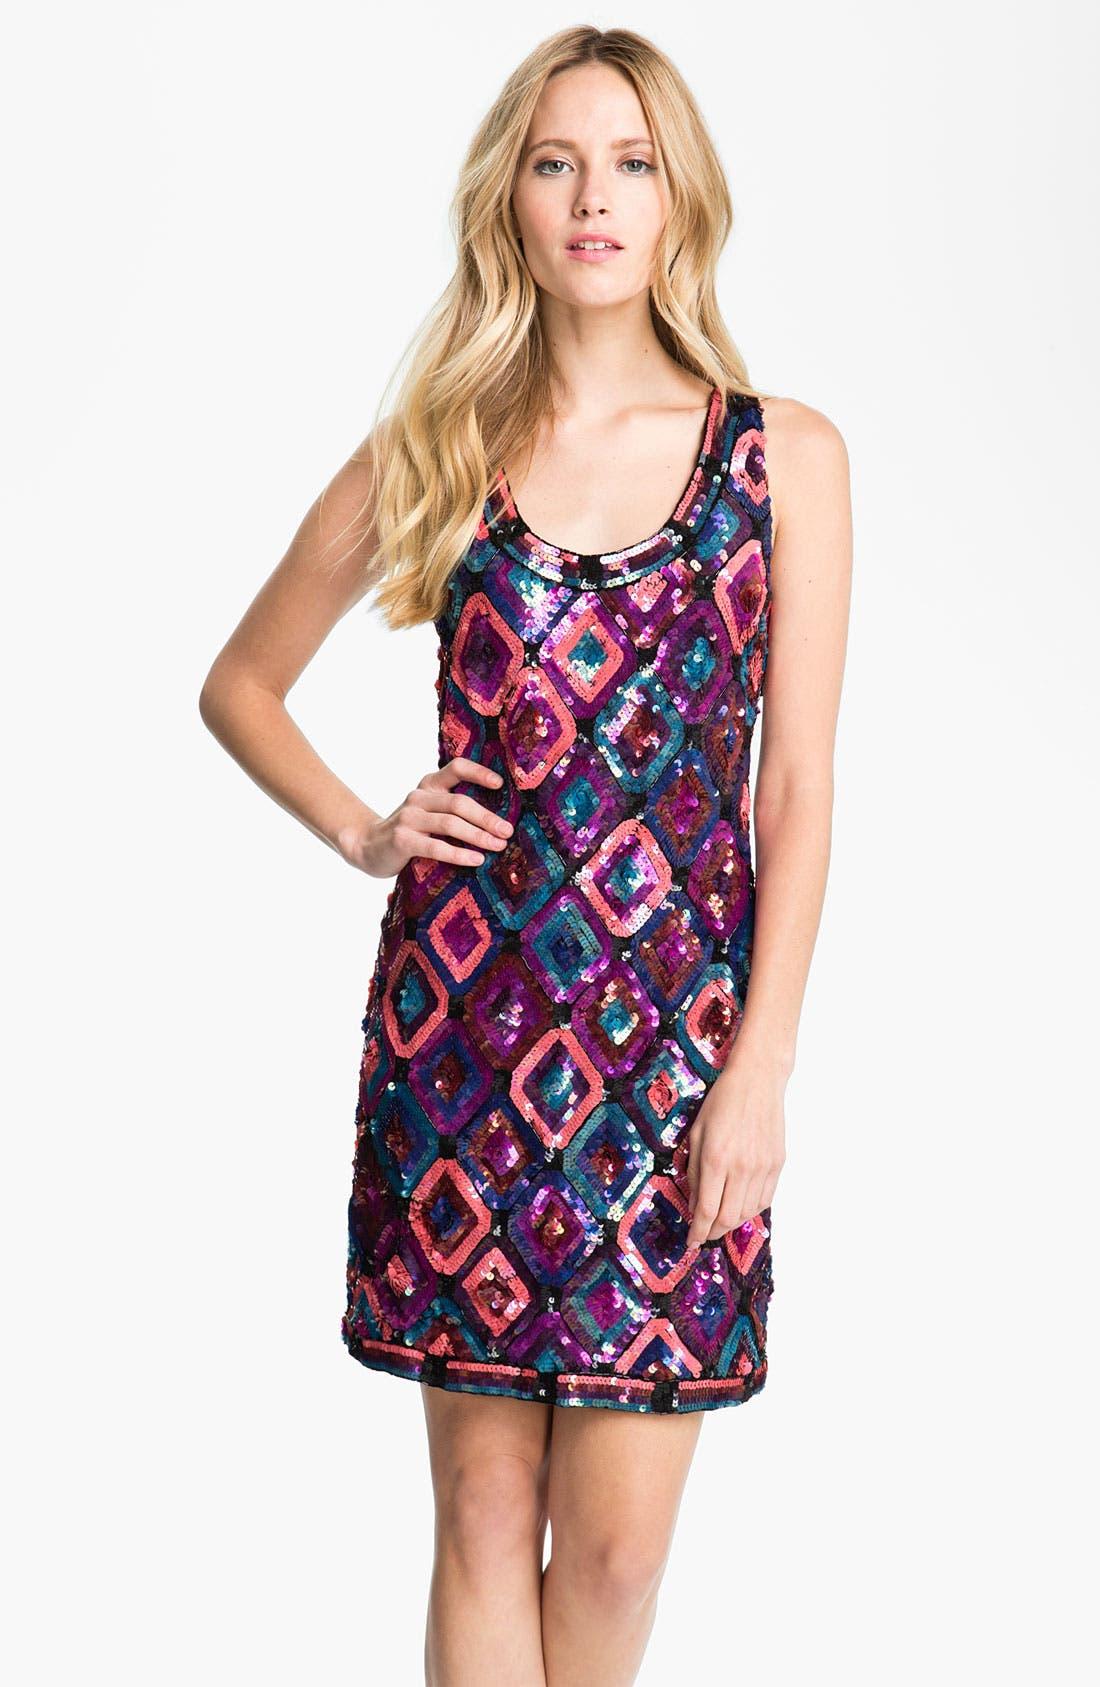 Alternate Image 1 Selected - Trina Turk Sequin Diamond Shift Dress